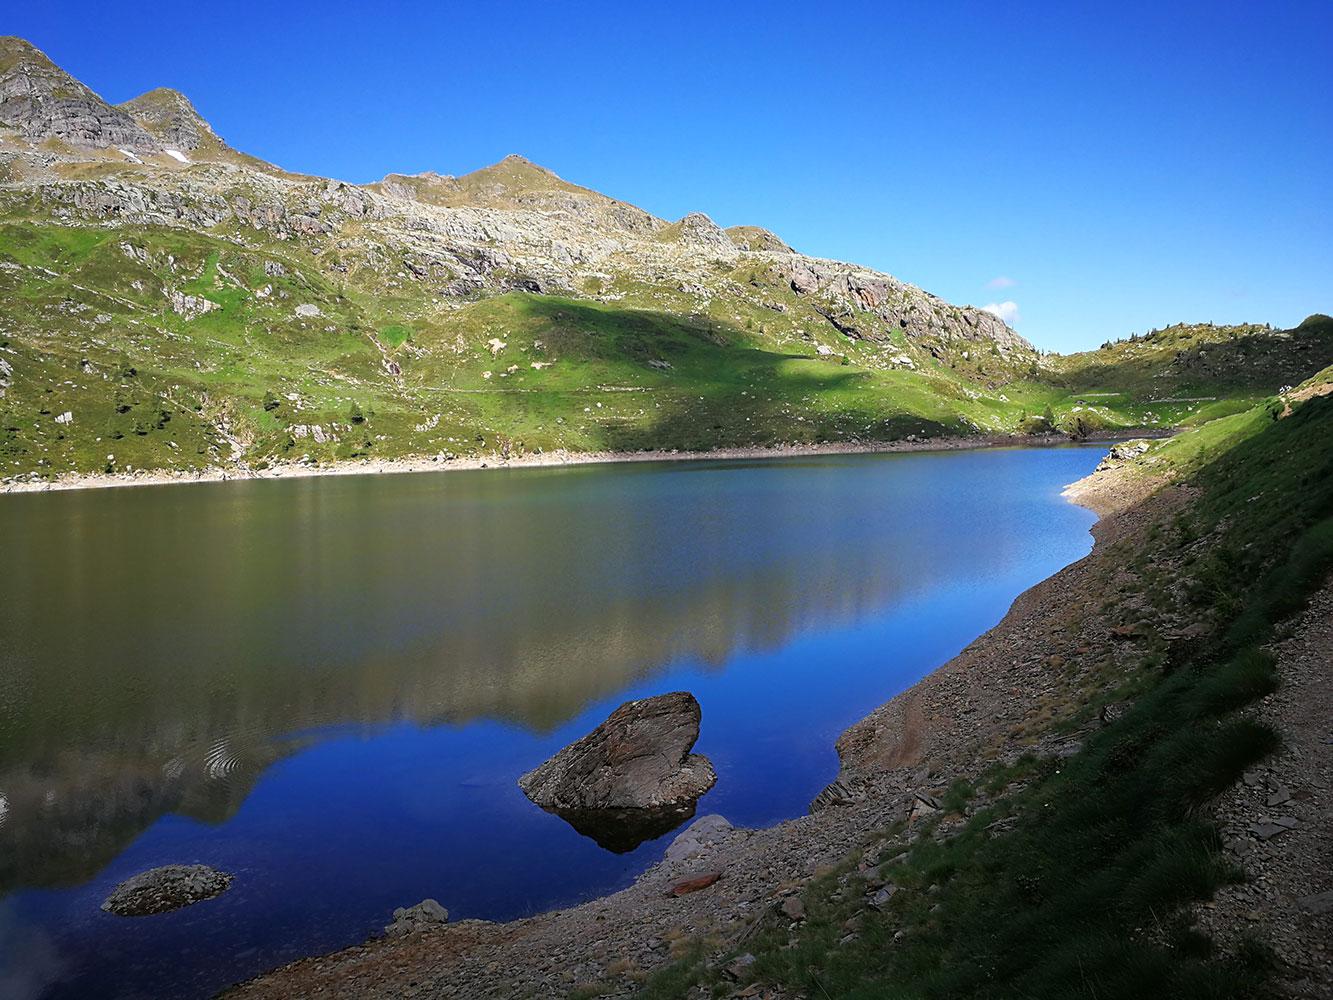 lago-gemelli-orobie